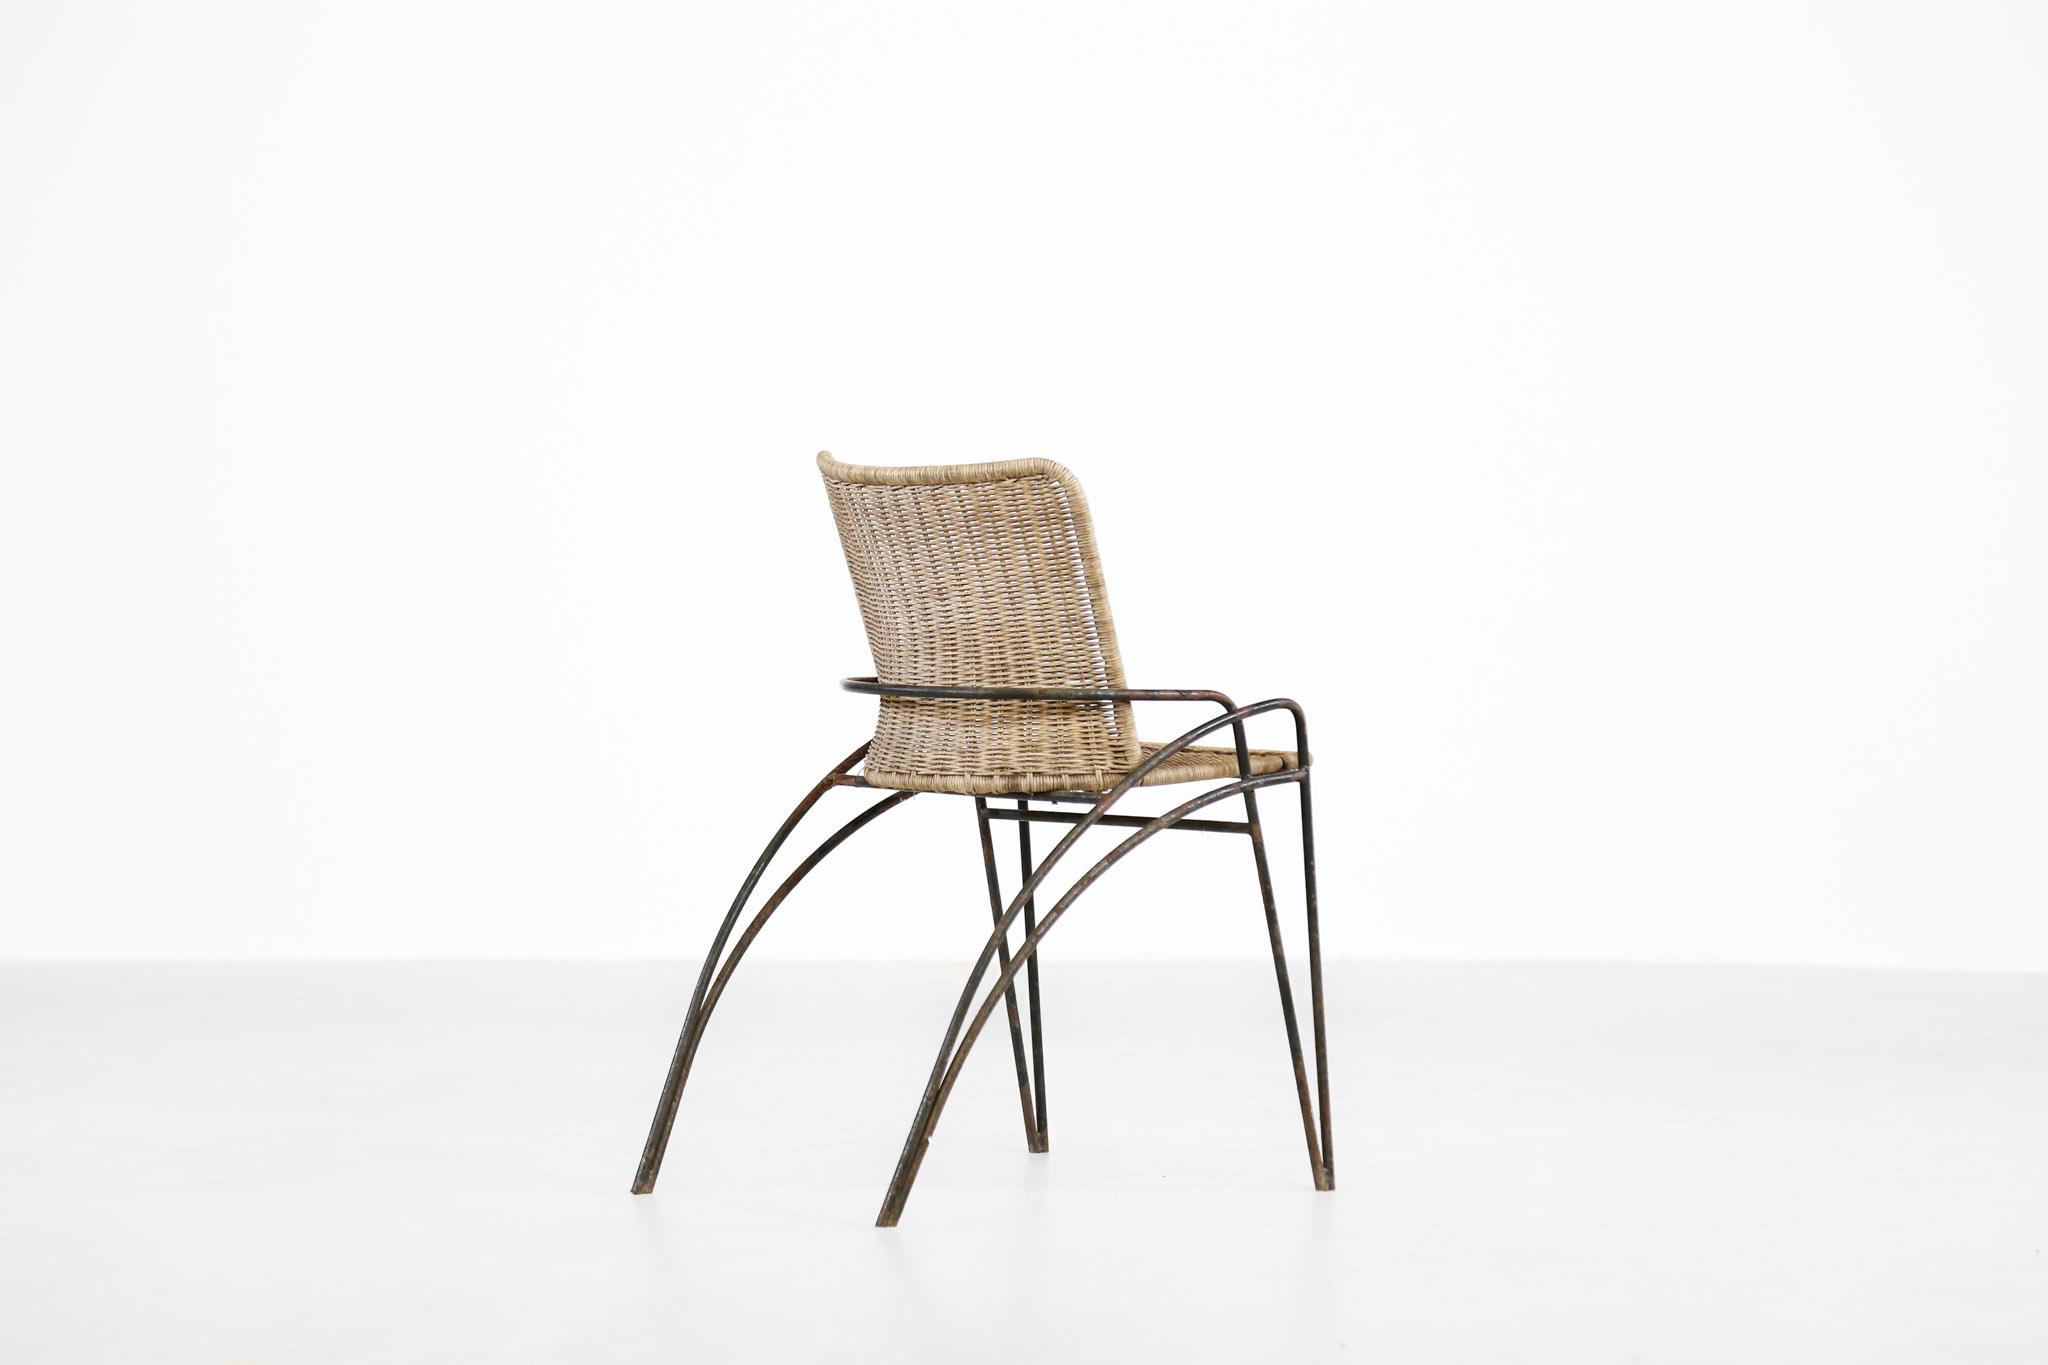 chaise design des ann es 50 attribu e raoul guys danke galerie. Black Bedroom Furniture Sets. Home Design Ideas